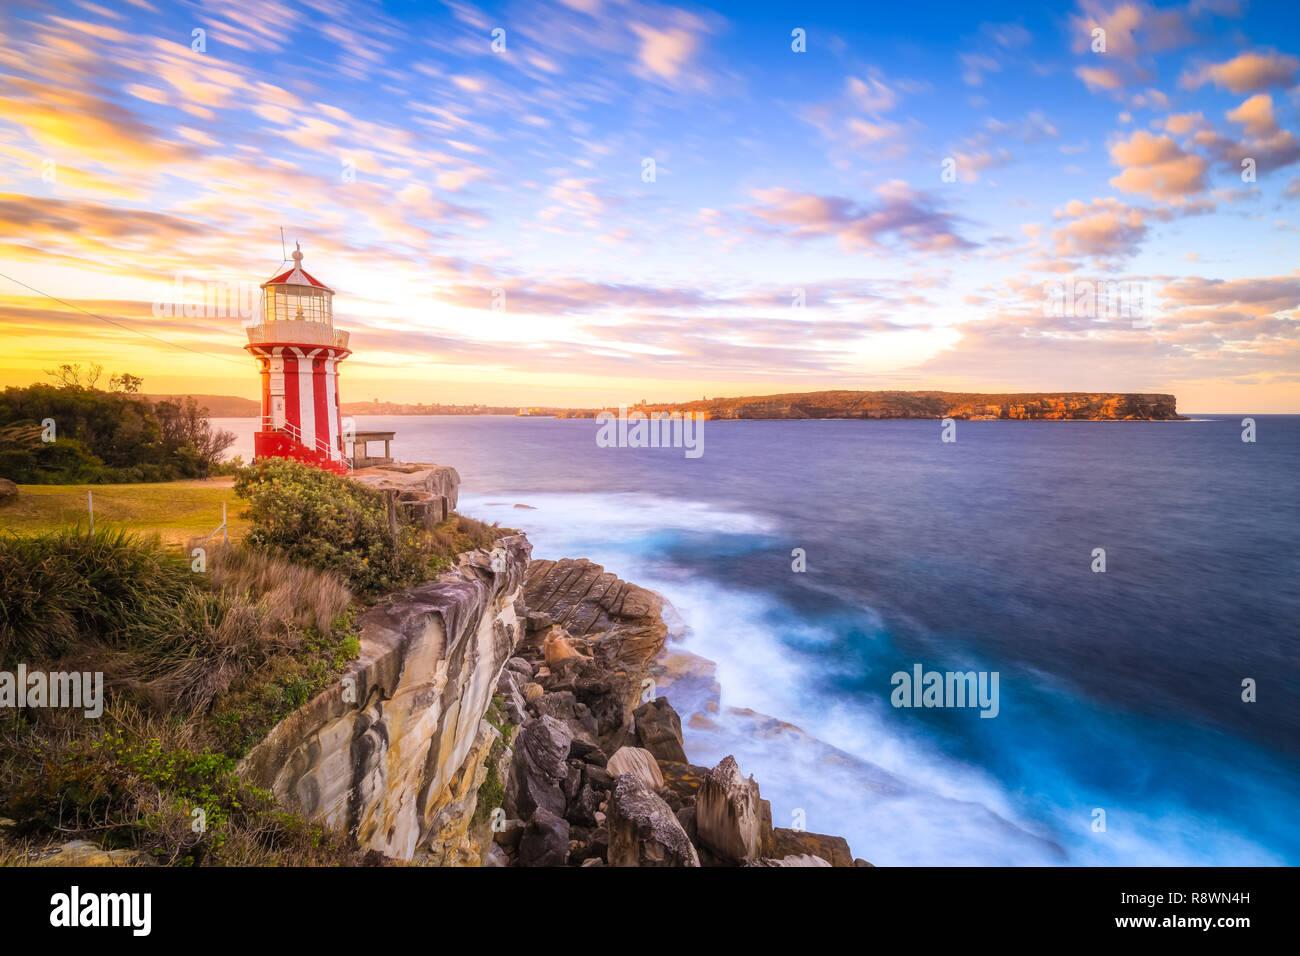 Hornby Lighthouse Sunset, Sydney Imagen De Stock